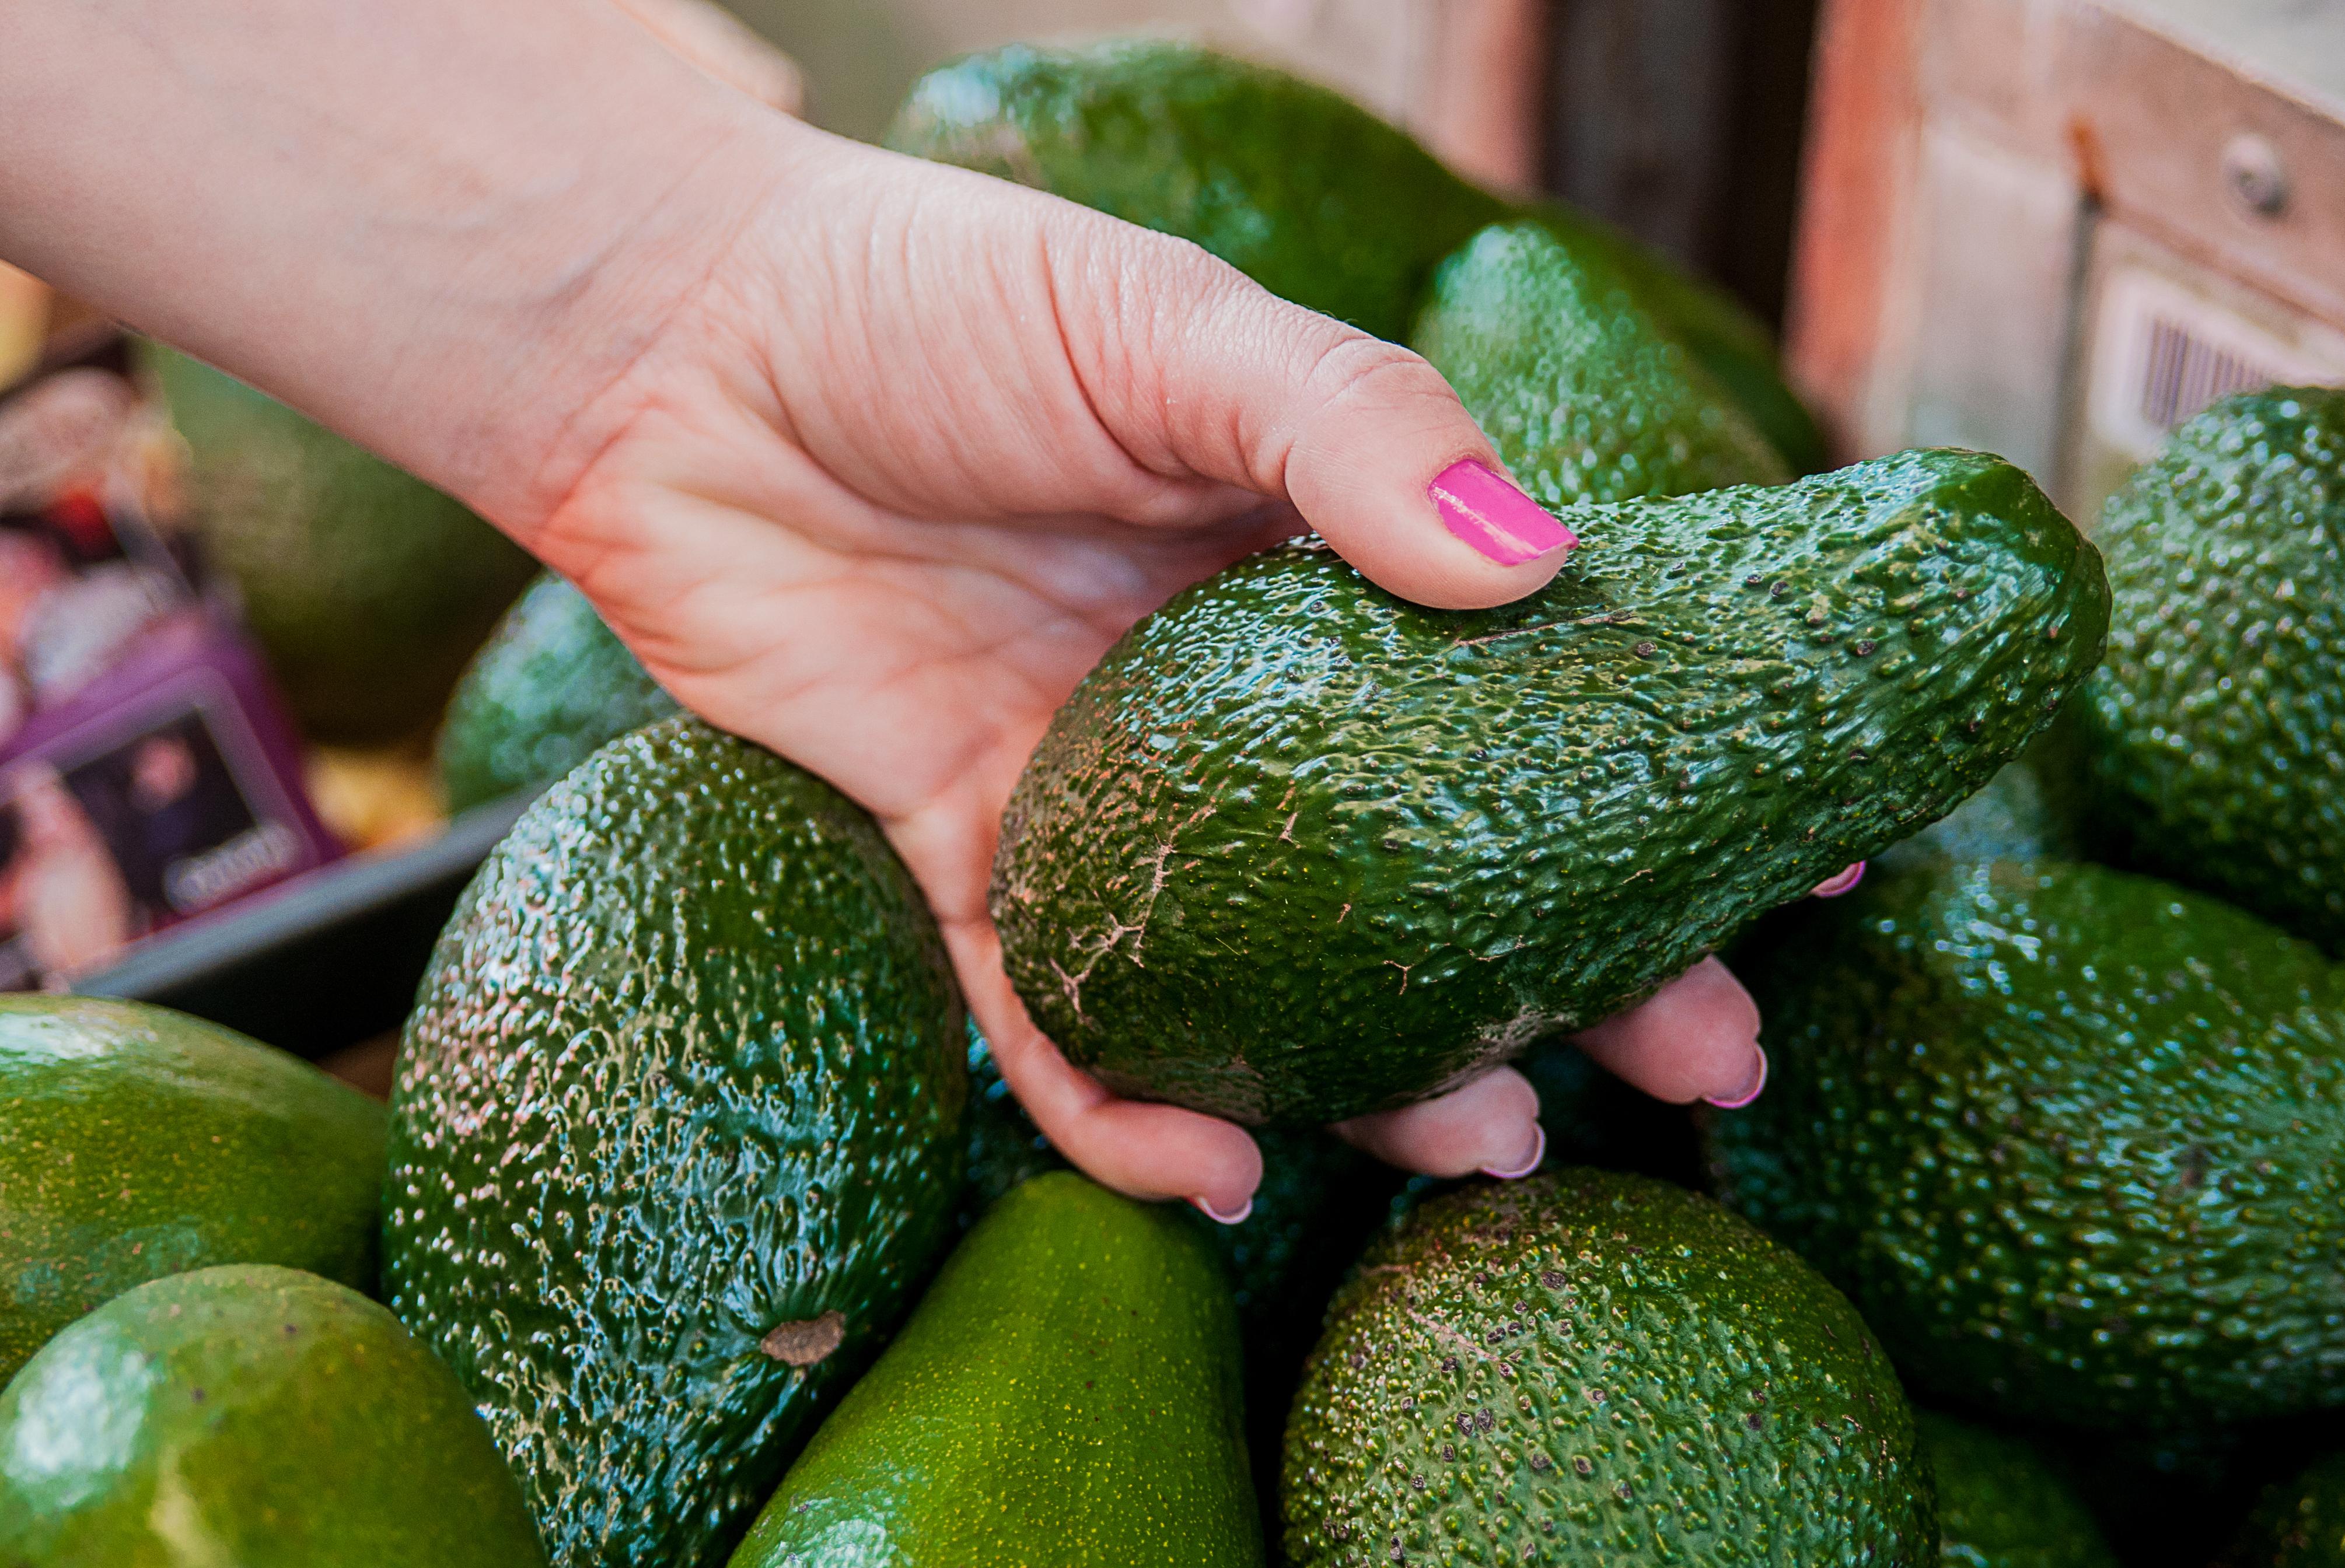 How to pick avocado